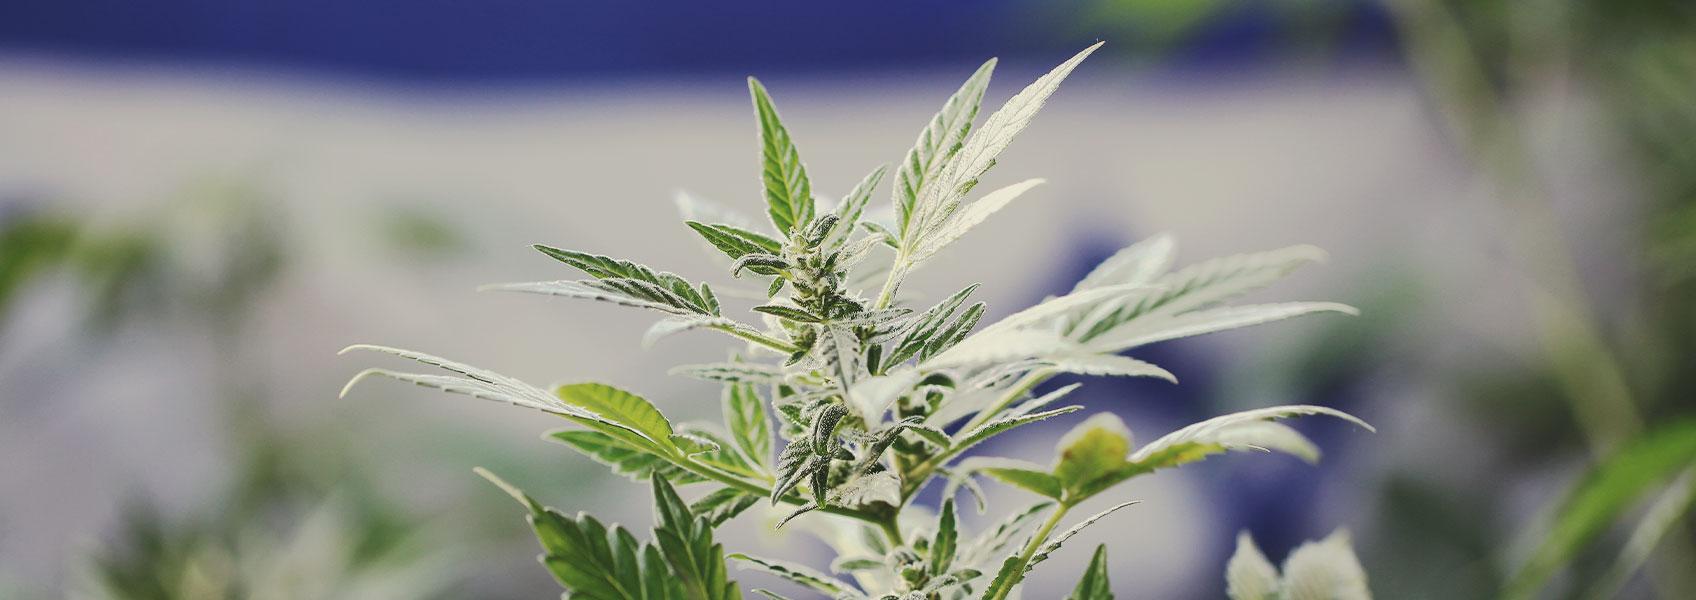 Marijuana Research in Israel: A Leading Model